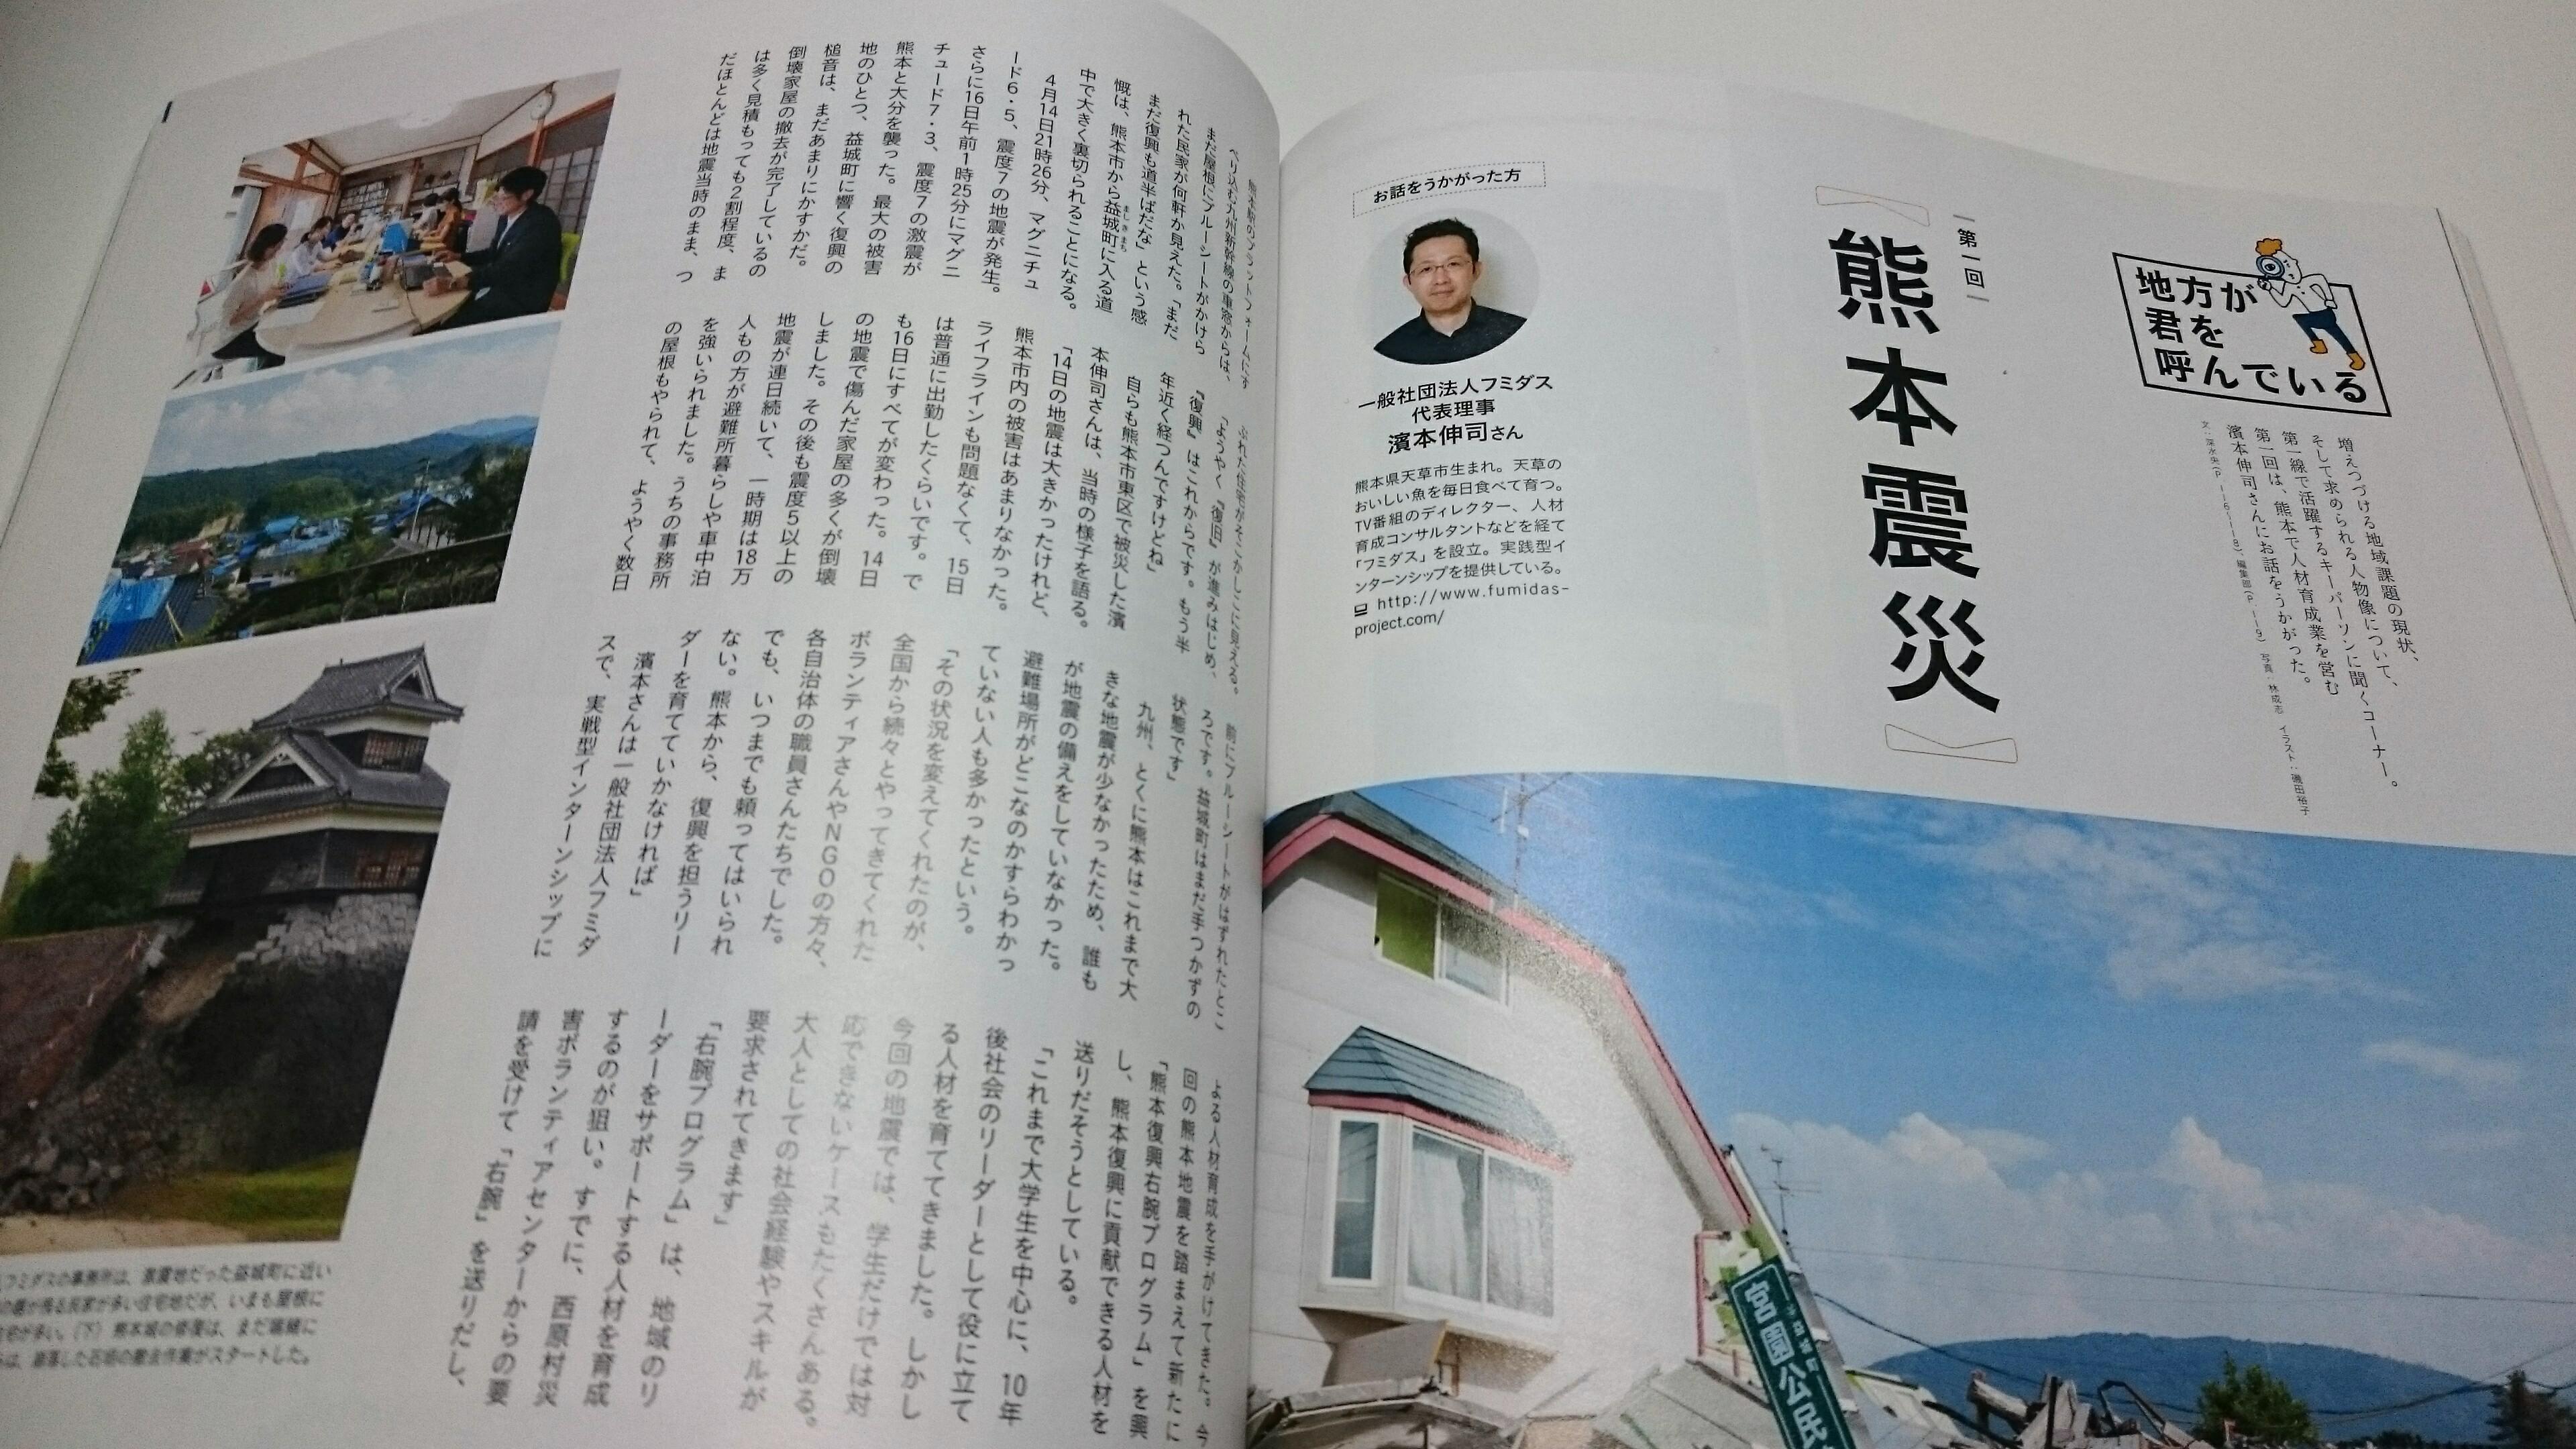 『TURNS』~Vol.20 2016~に、熊本復興・右腕プログラムについて掲載いただきました。